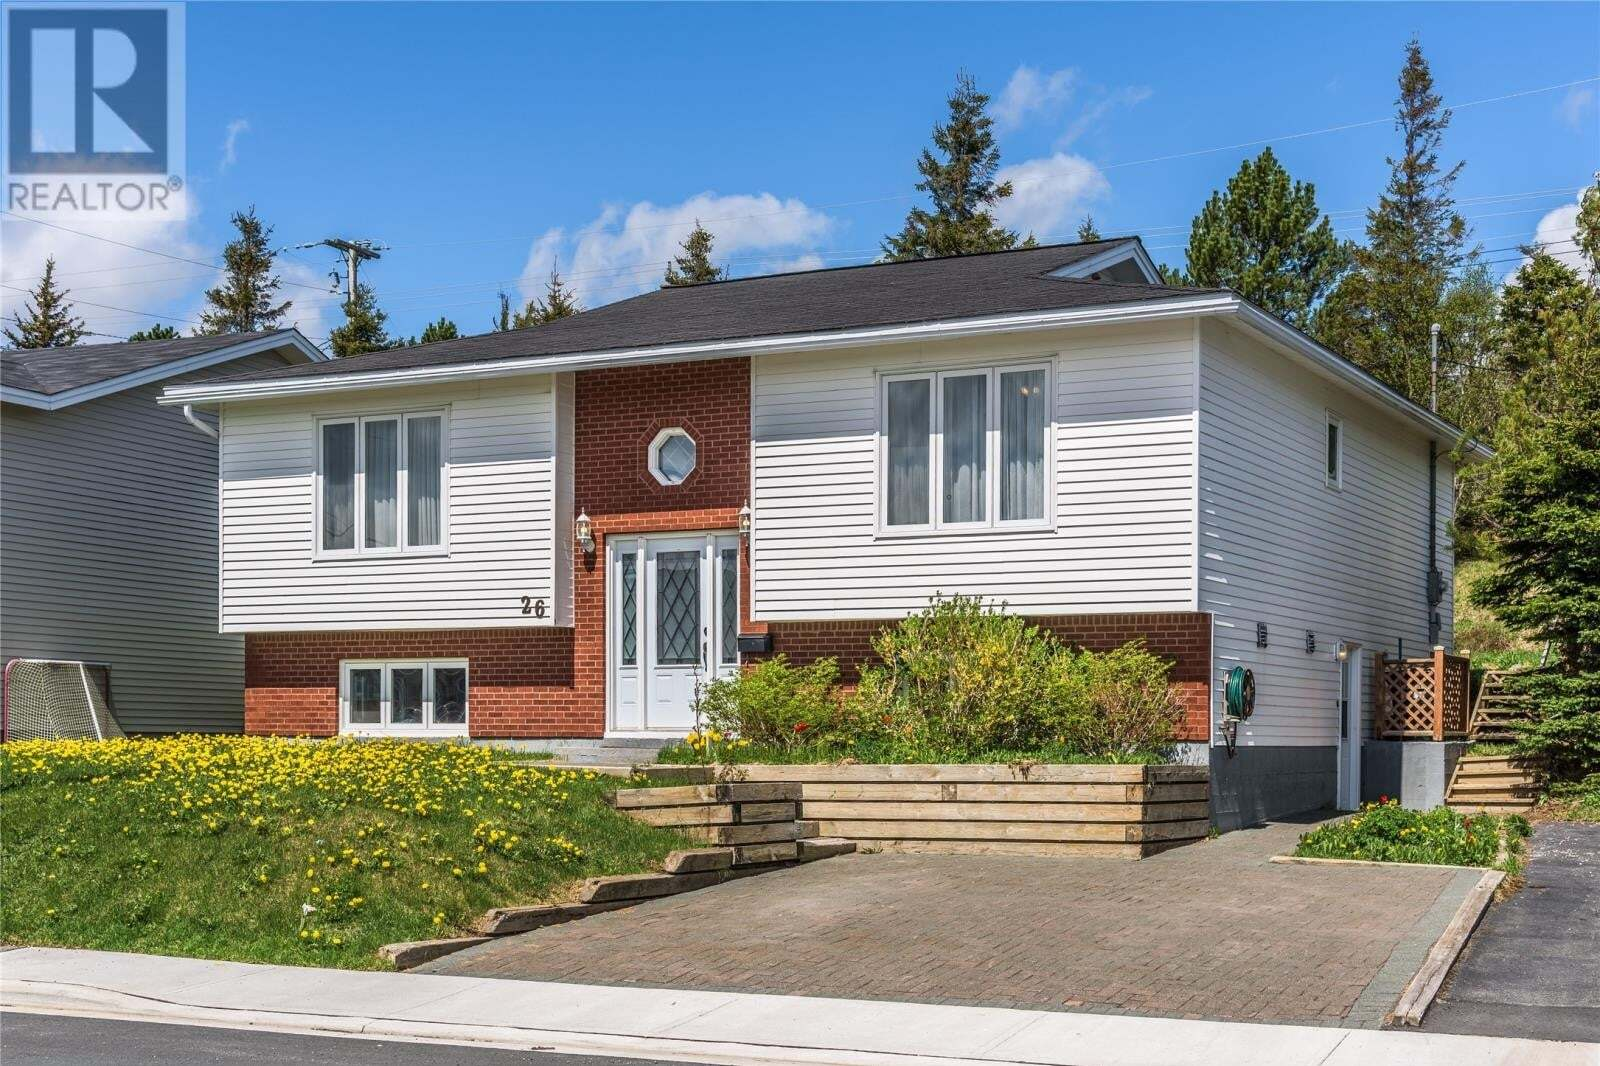 House for sale at 26 Bellevue Cres St. John's Newfoundland - MLS: 1214667